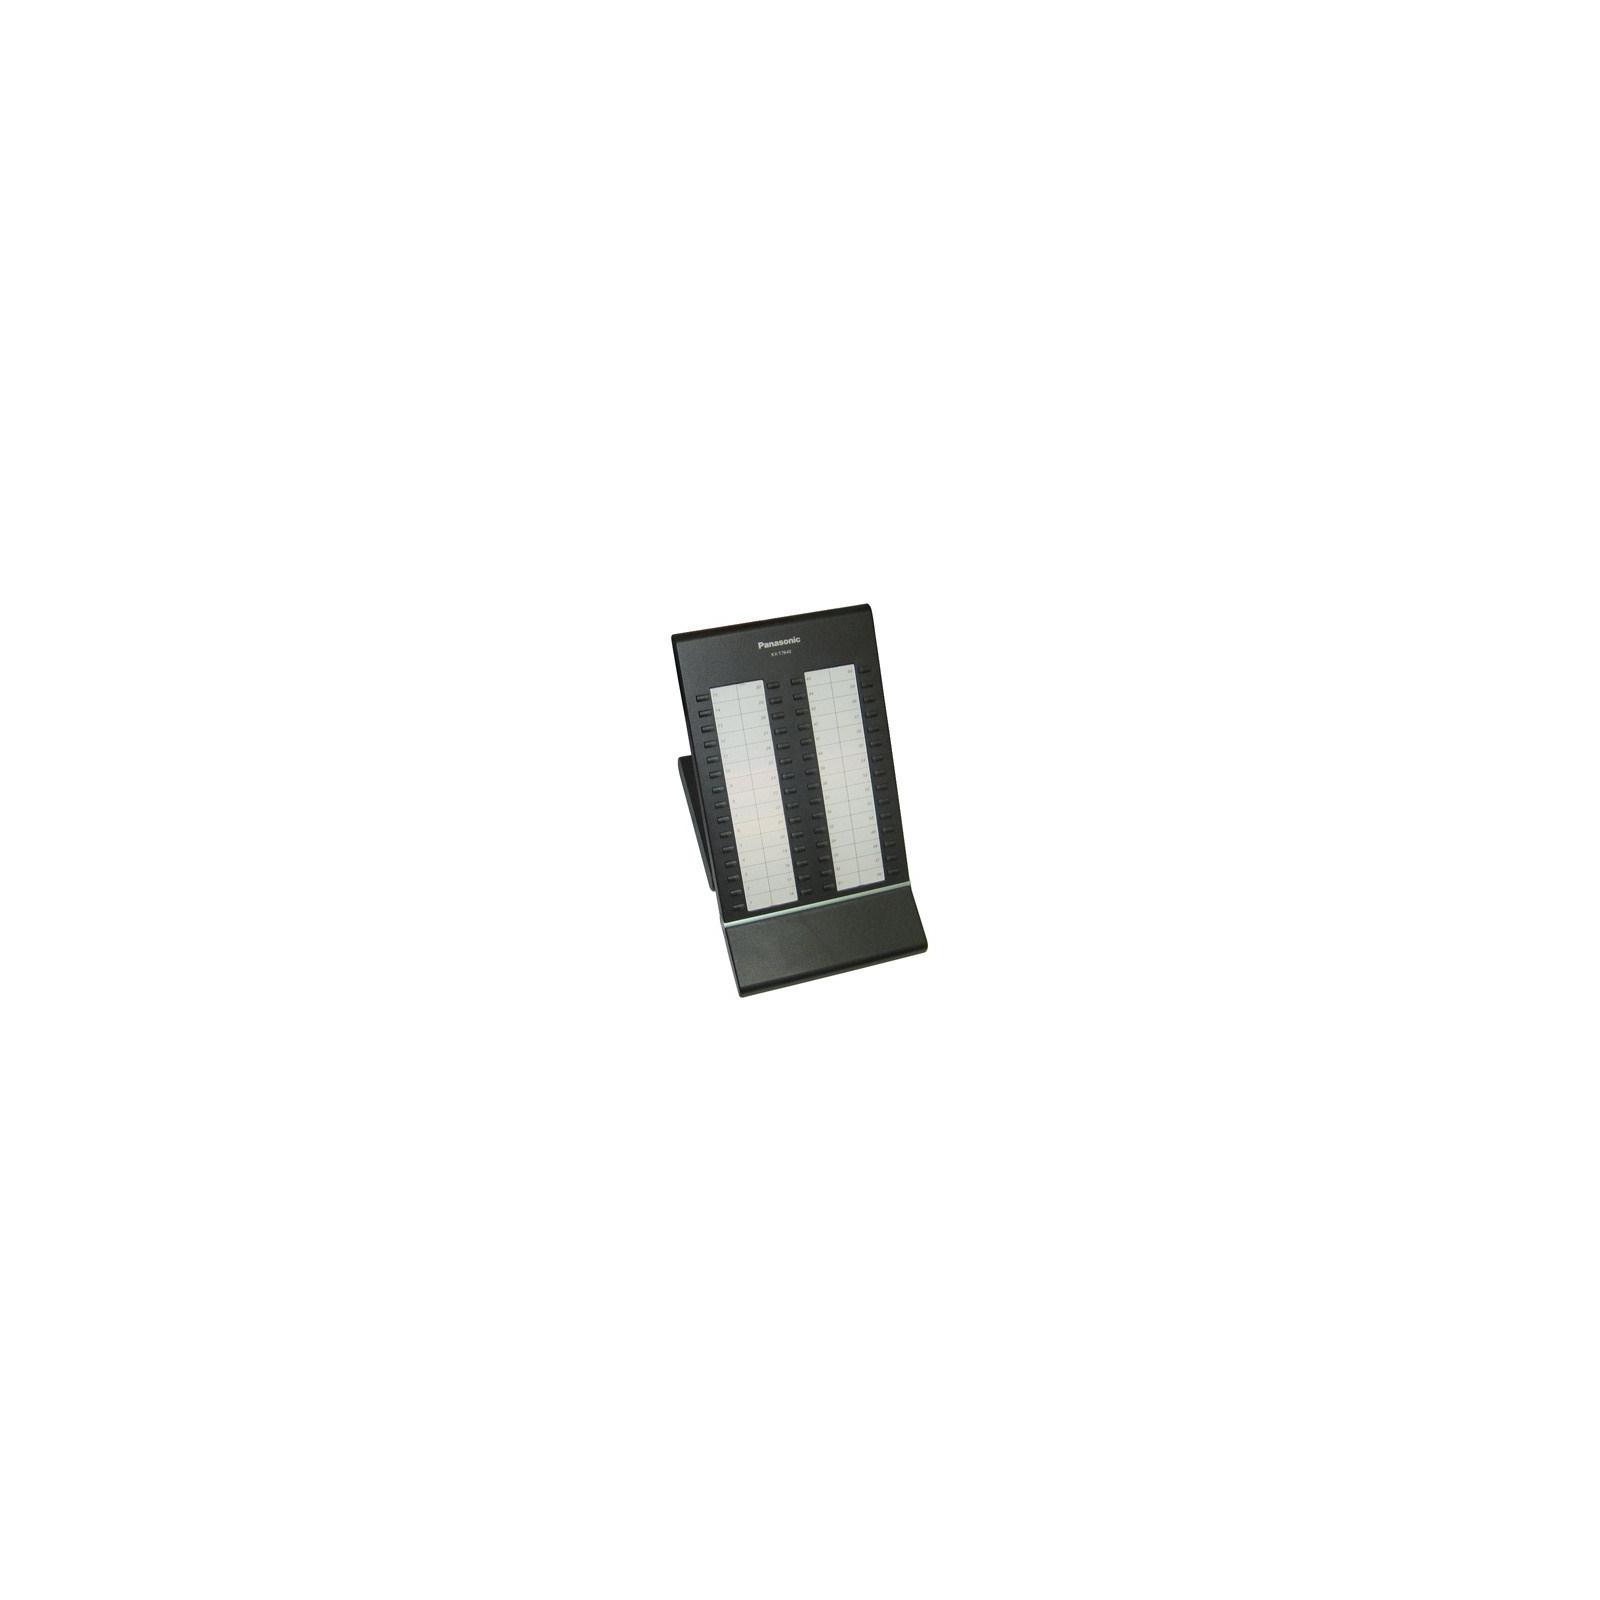 Системная консоль PANASONIC KX-T7640X-B